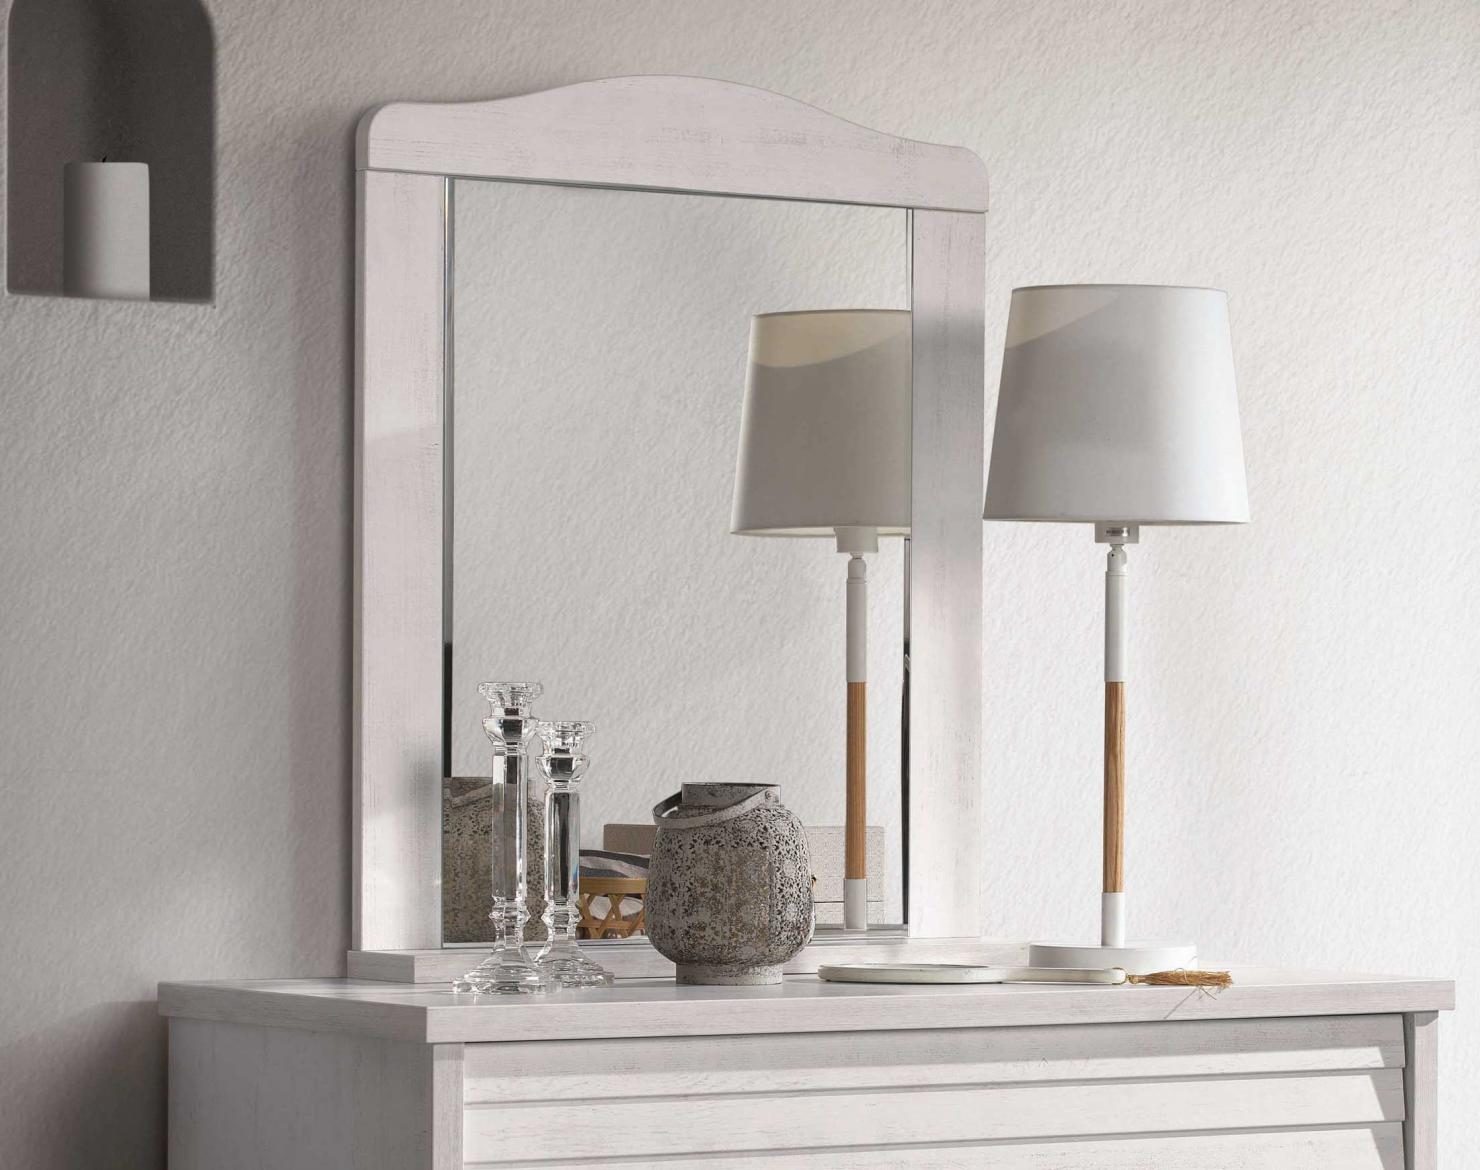 miroir mural poser ou suspendre olivia meubles c lio. Black Bedroom Furniture Sets. Home Design Ideas